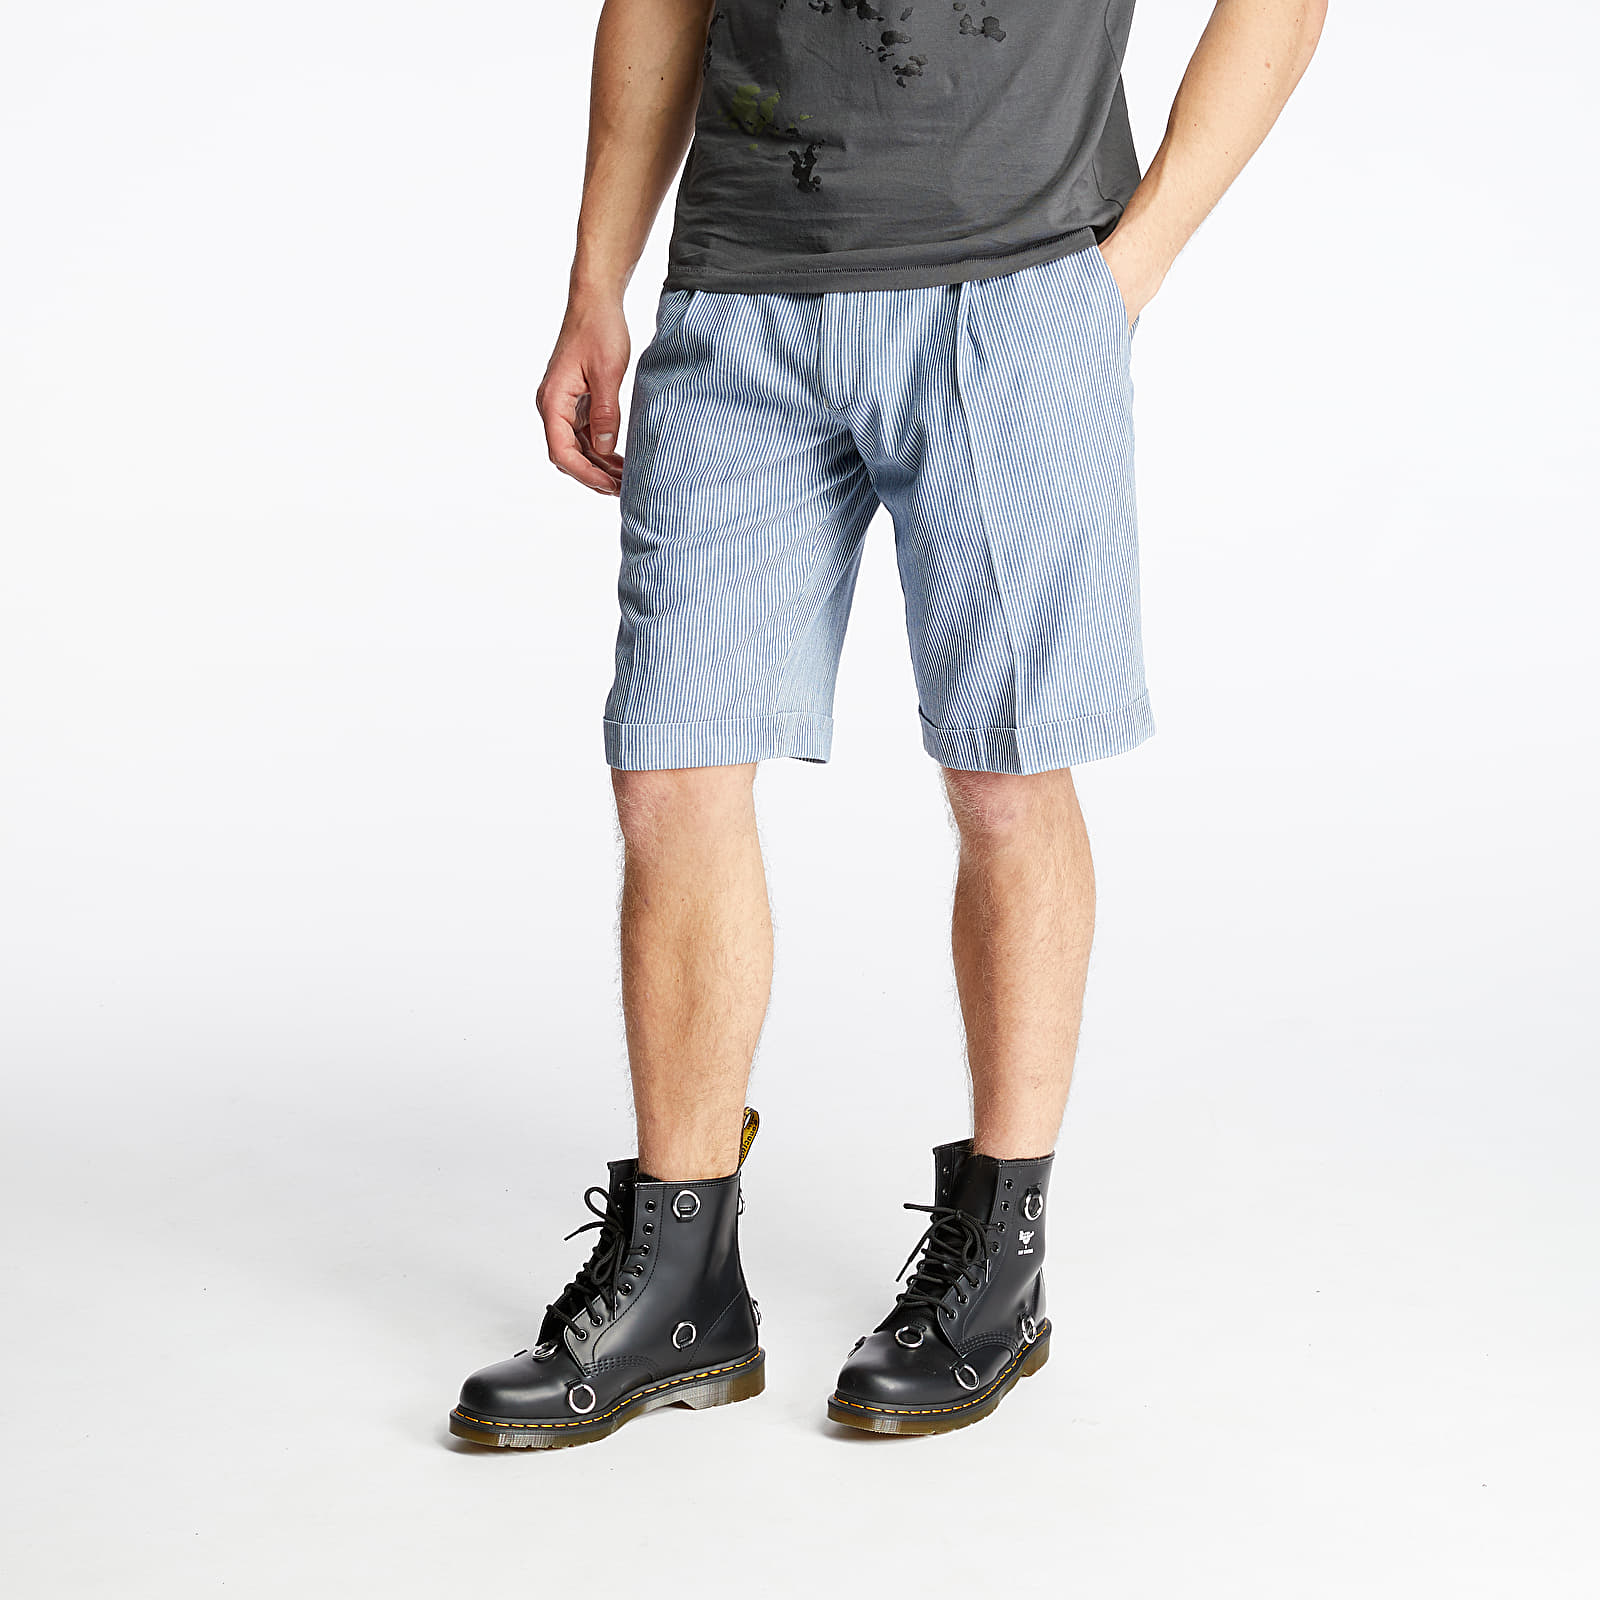 Shorts Pietro Filipi Men's Japanese Denim Shorts Blue